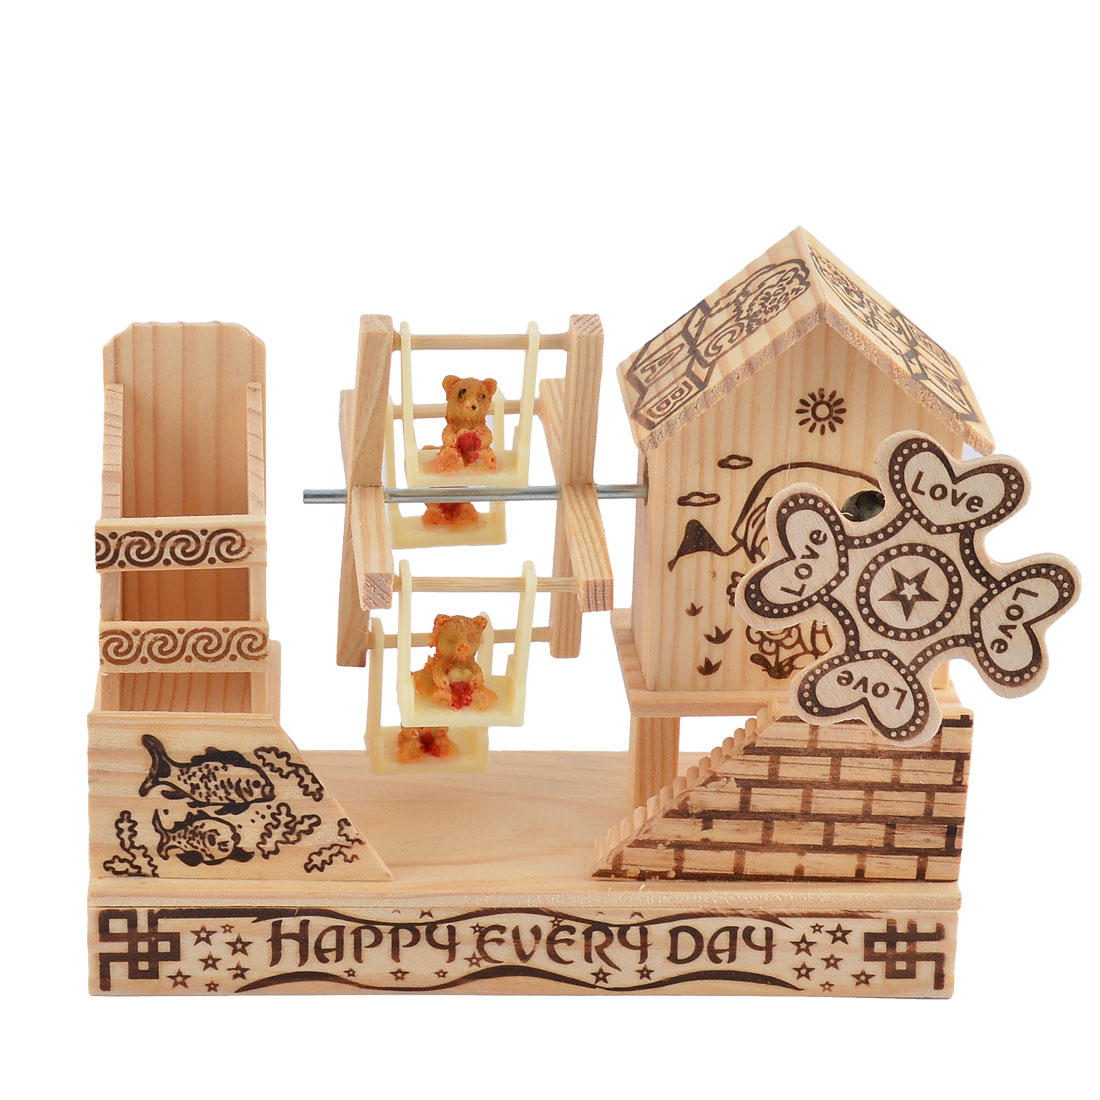 Birthday Gift Wooden House Shaped Little Animal Windmill Decor Music Box Desktop Decor Beige